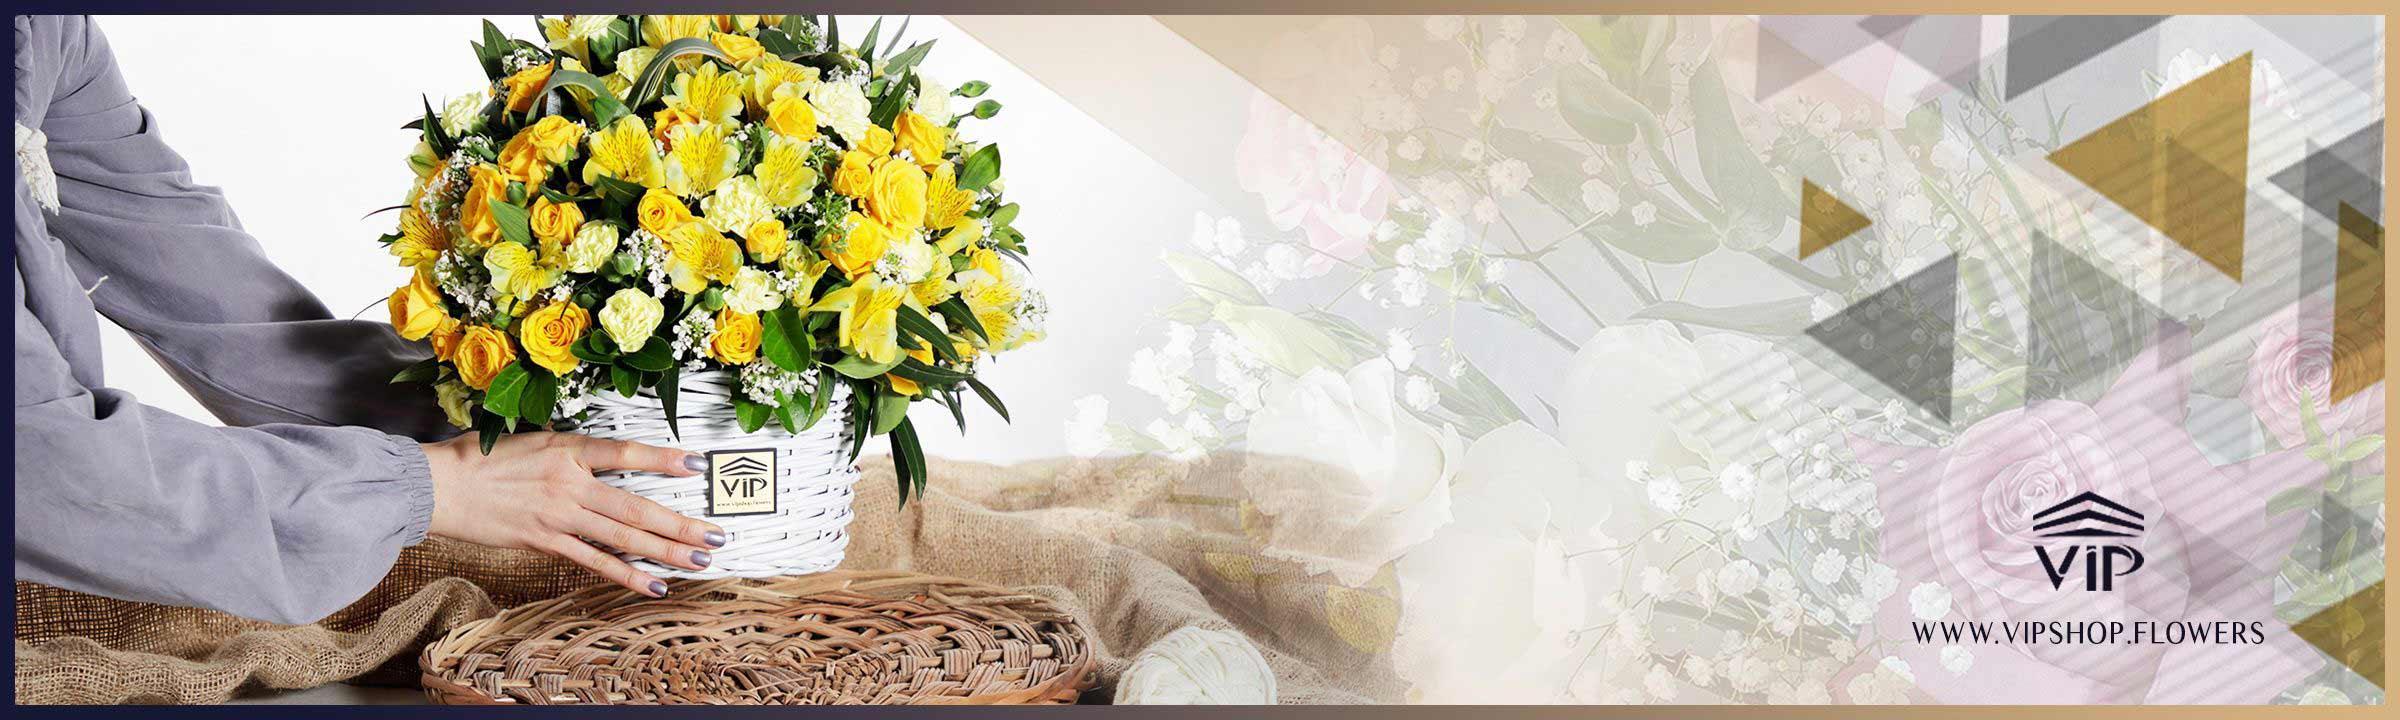 سبد گل - گلفروشی آنلاین VIP Shop